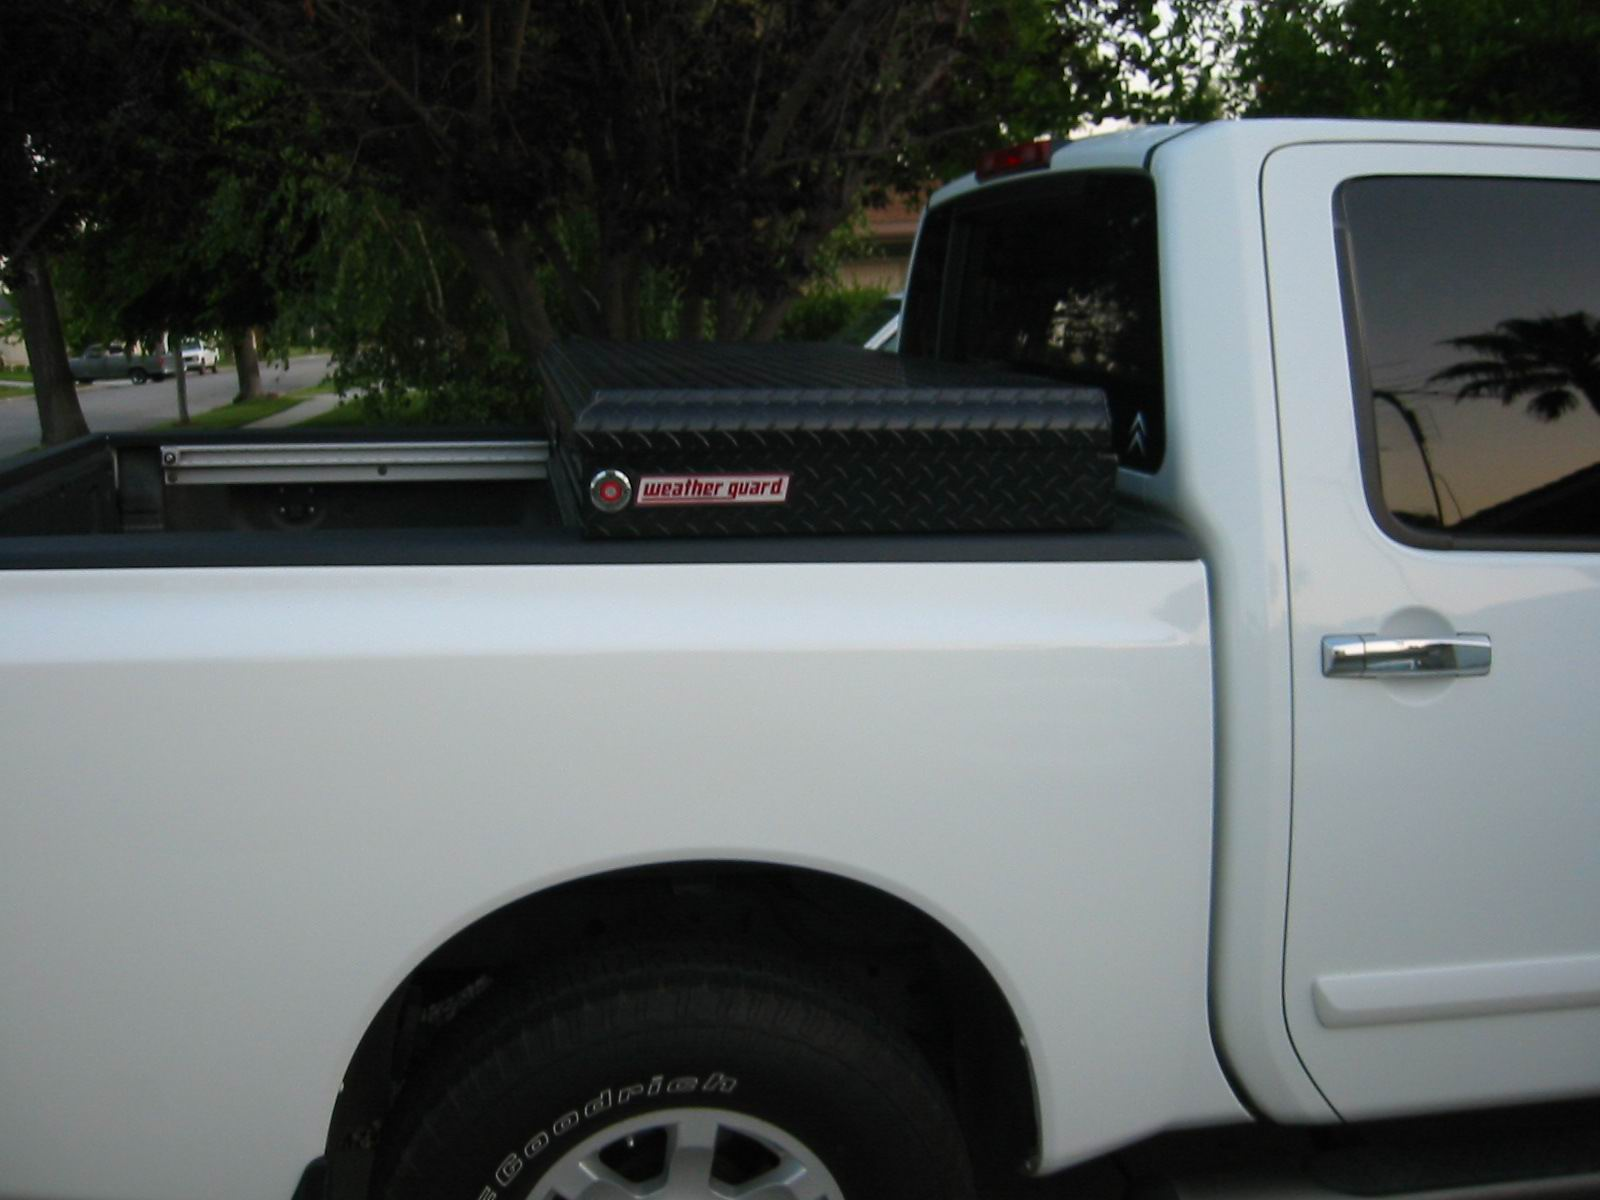 weatherguard tool box low profile. post pictures with weather guard tool box-t1.jpg weatherguard box low profile